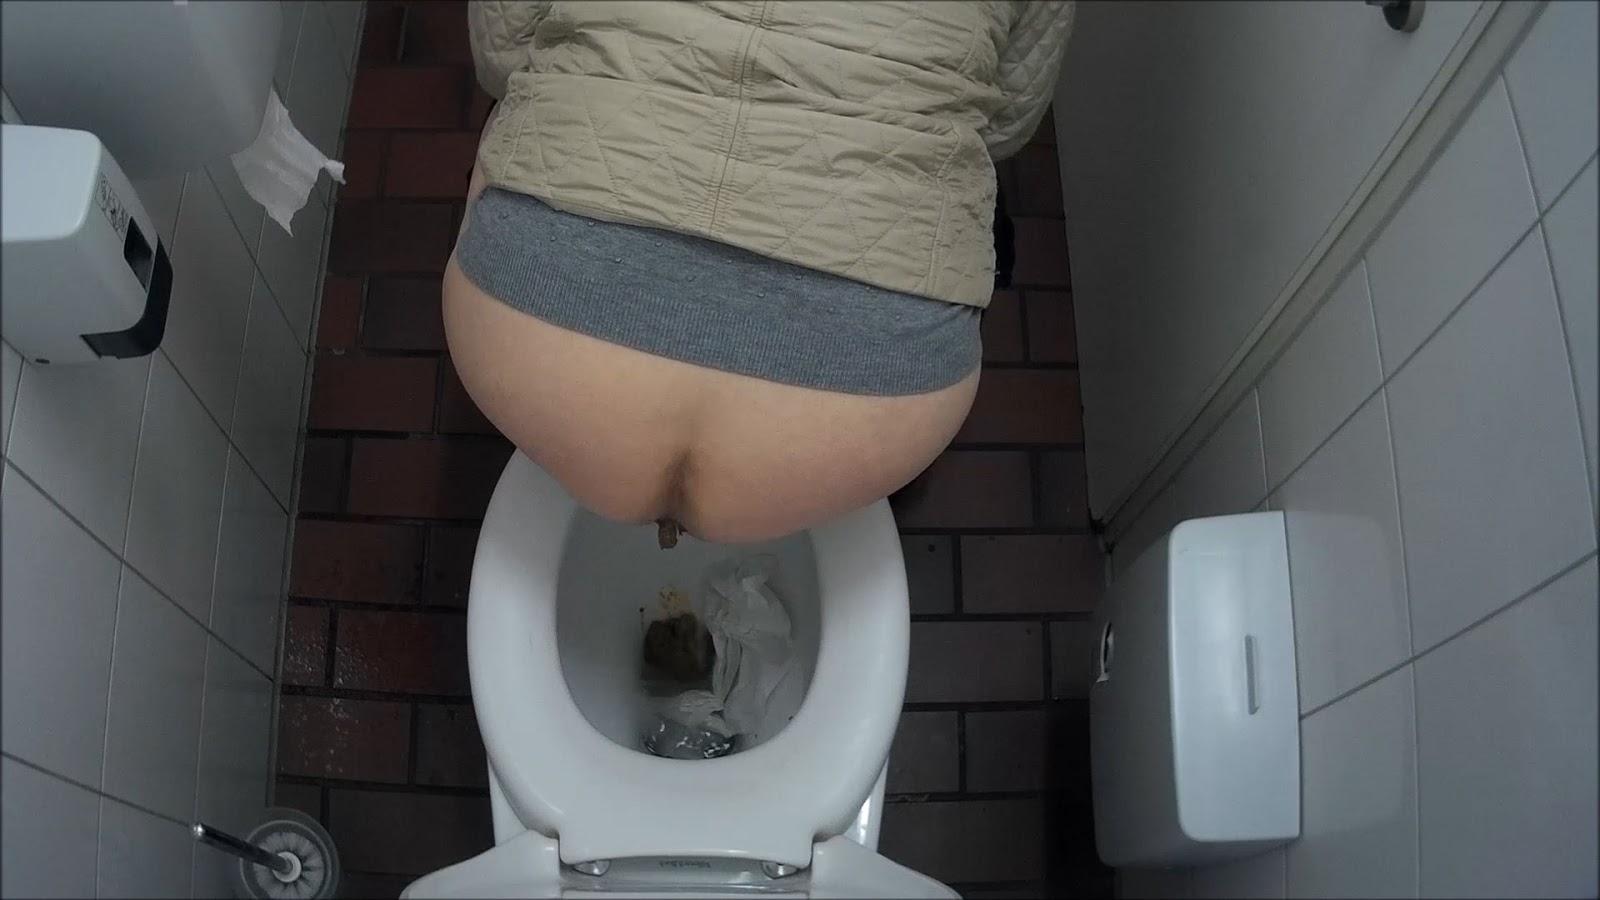 Voyeur Zone: Germany public toilet 2